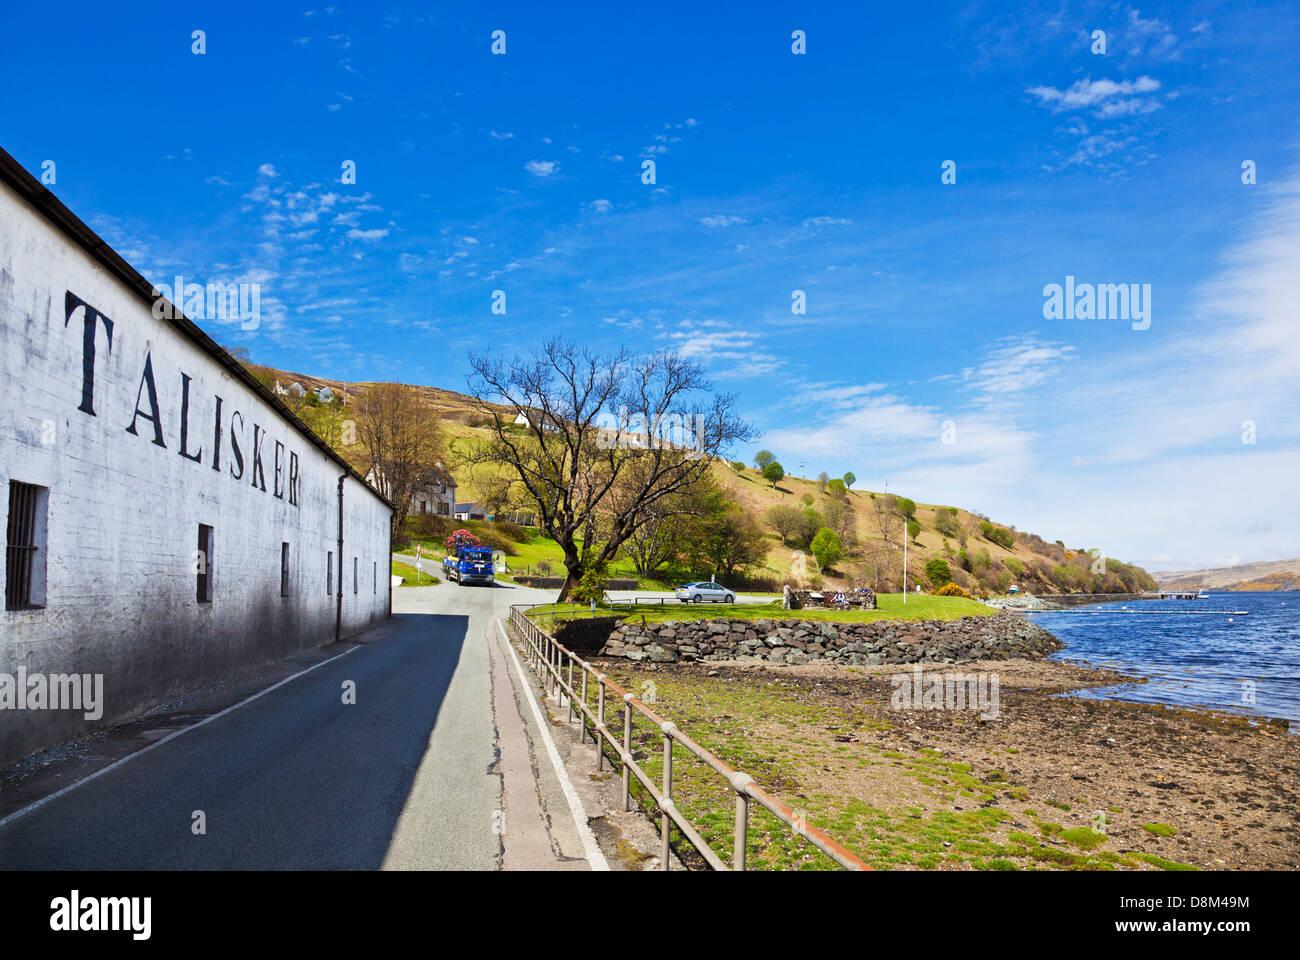 Talisker distillery buildings exterior Isle of Skye Highlands and Islands Scotland UK GB EU Europe - Stock Image